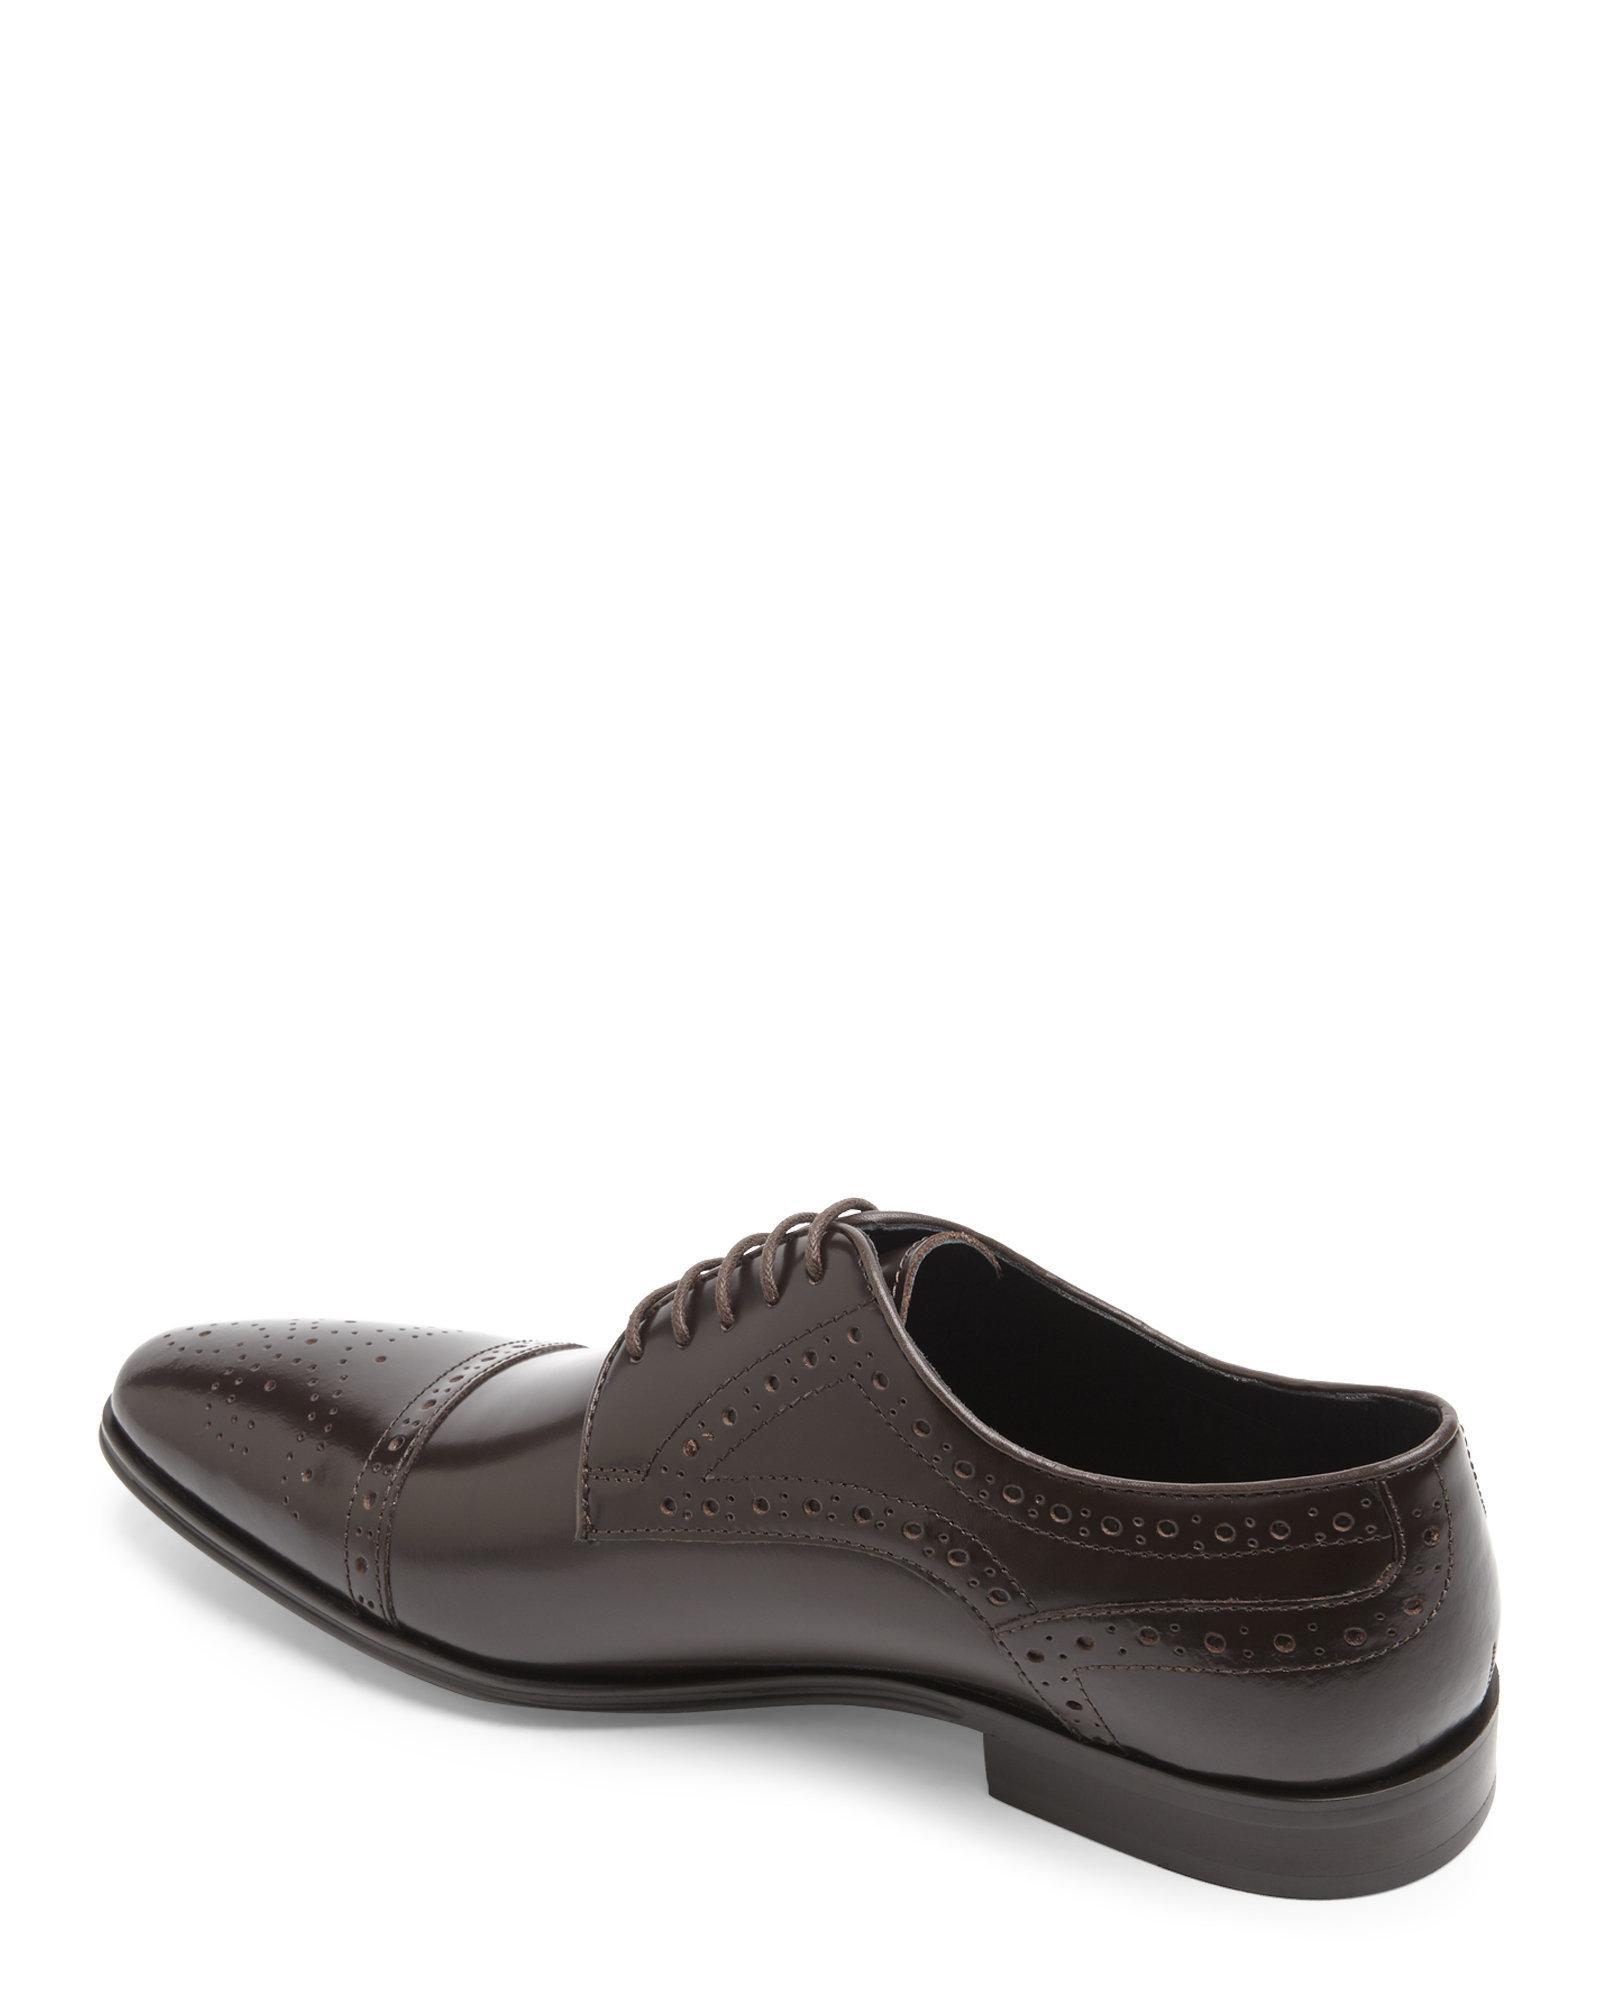 371d888a06d Lyst - Versace Dark Brown Cap Toe Brogue Oxfords in Brown for Men